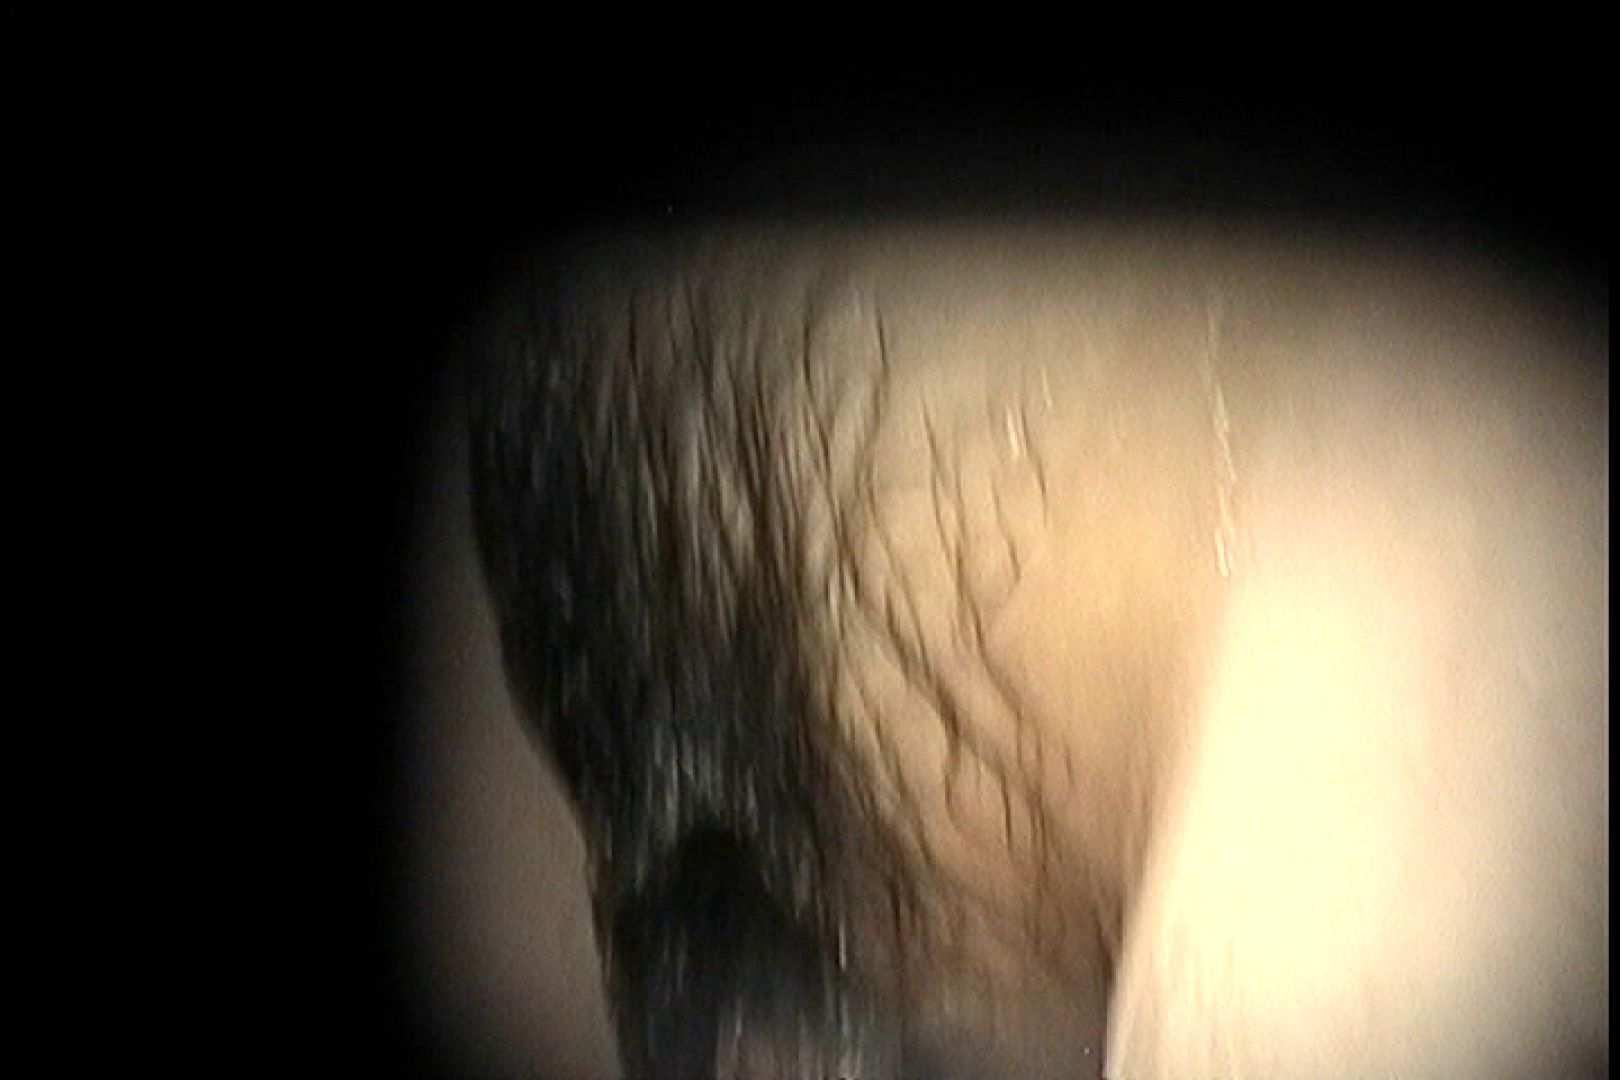 No.41 陰茎から滴り落ちる水滴 接写 | ギャル  20画像 14